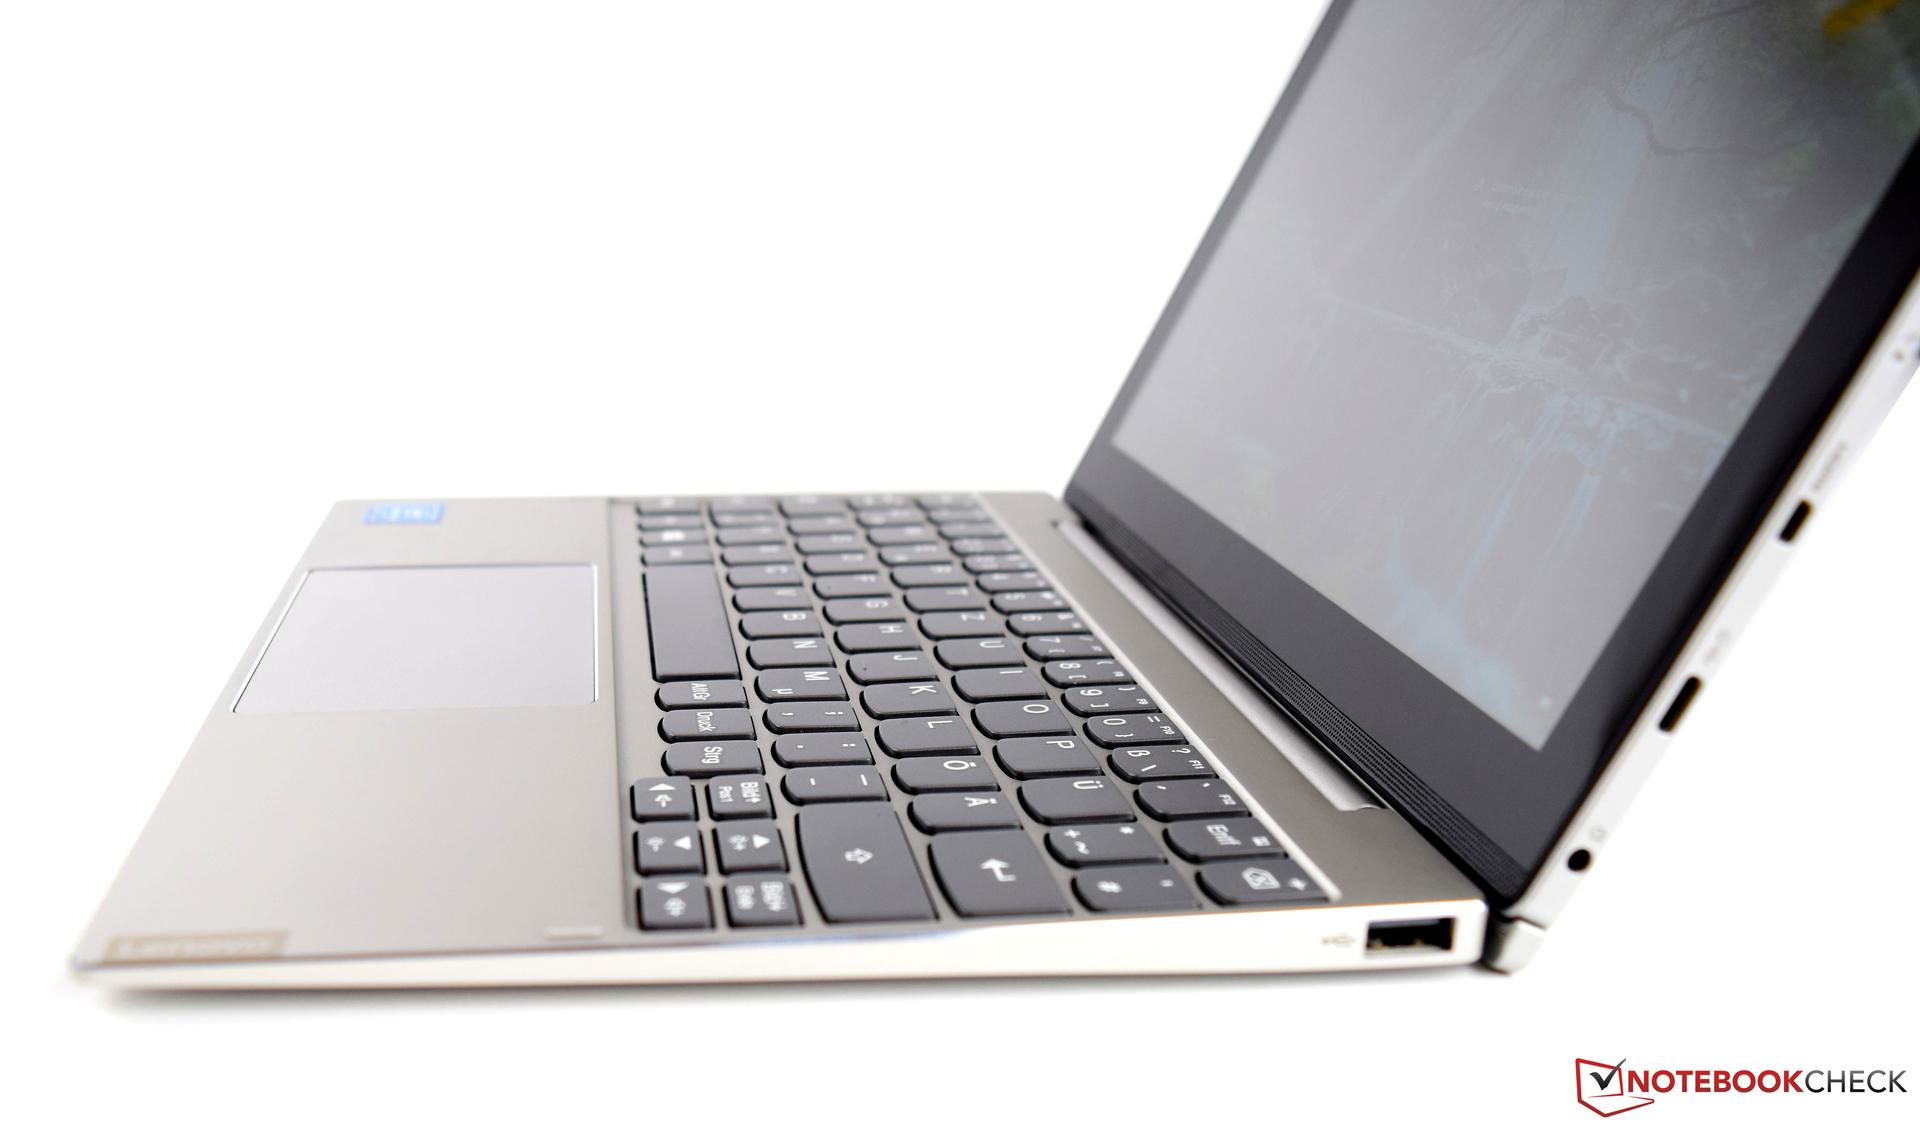 Book Open Png Test Lenovo Ideapad Miix 320 Pro X5 Z8350 Lte 128 Gb